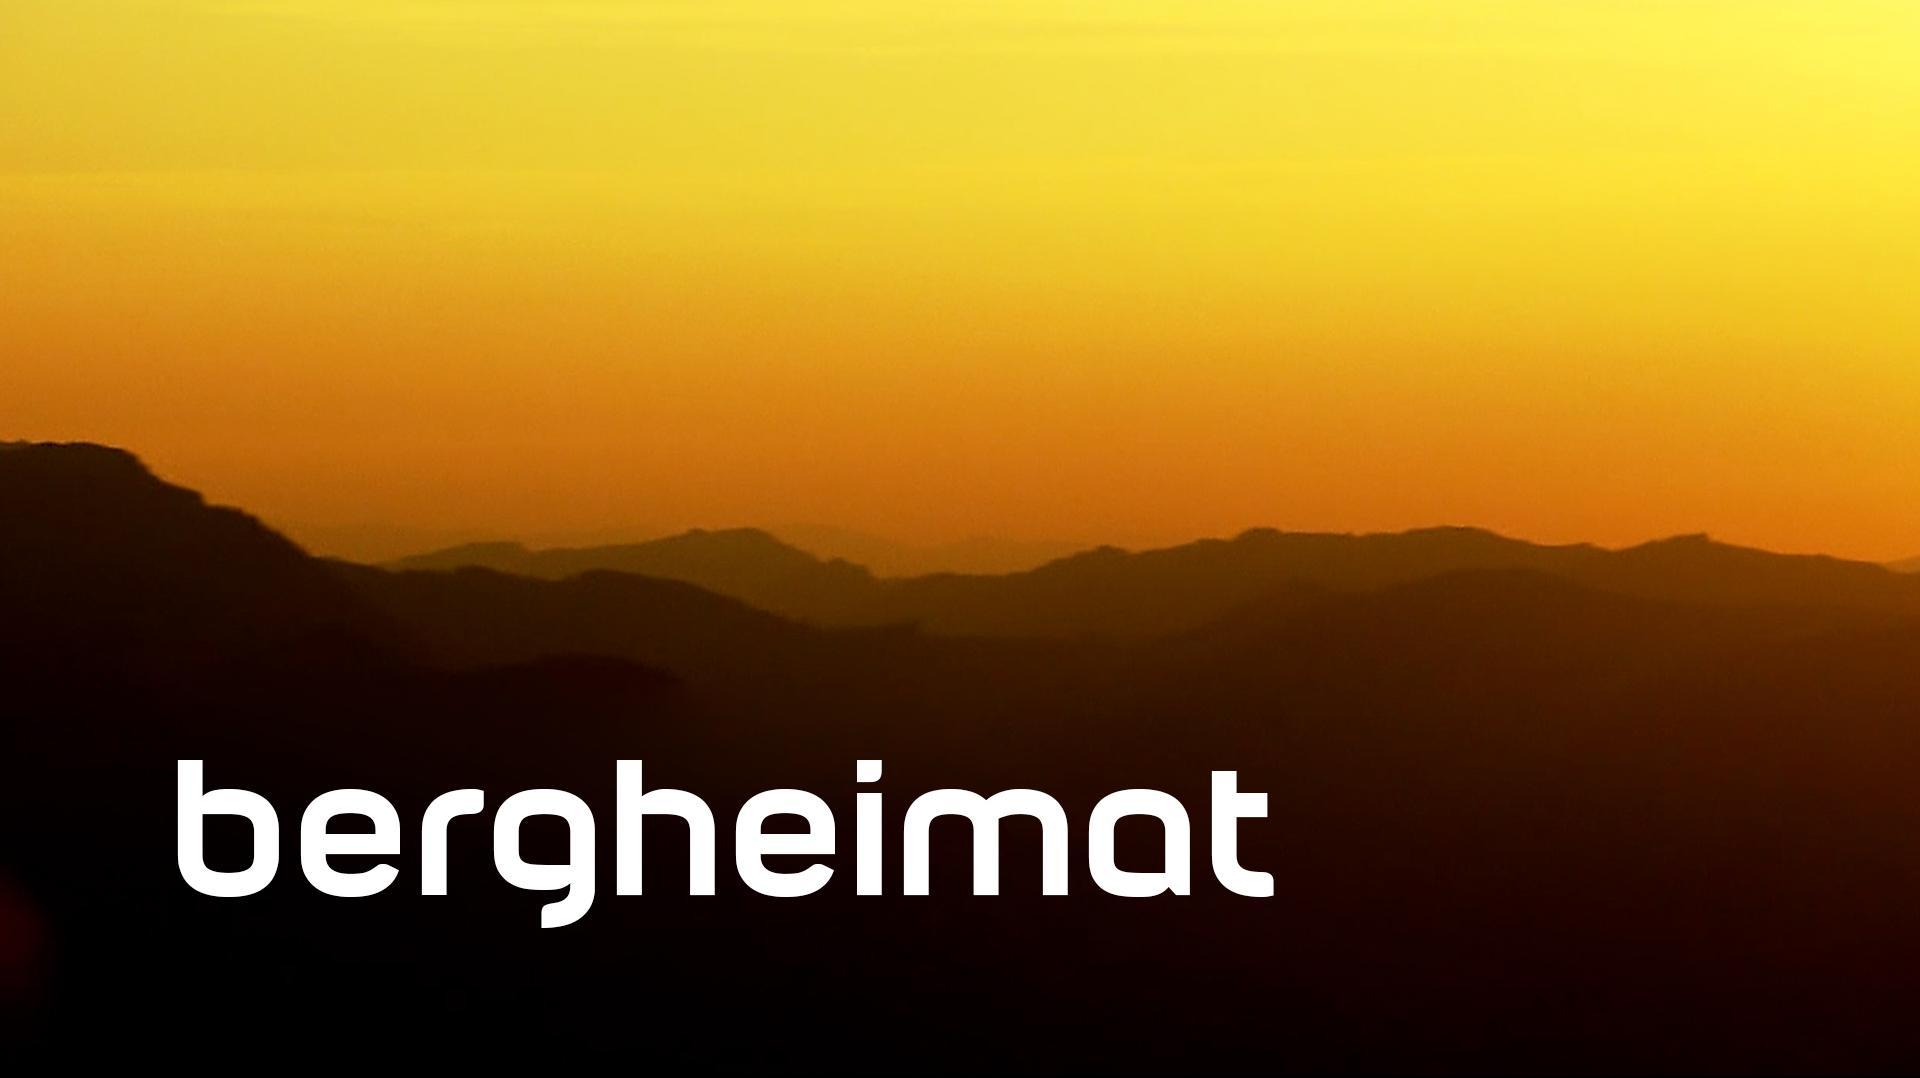 Bergheimat Staffel 7 Episodenguide Fernsehseriende